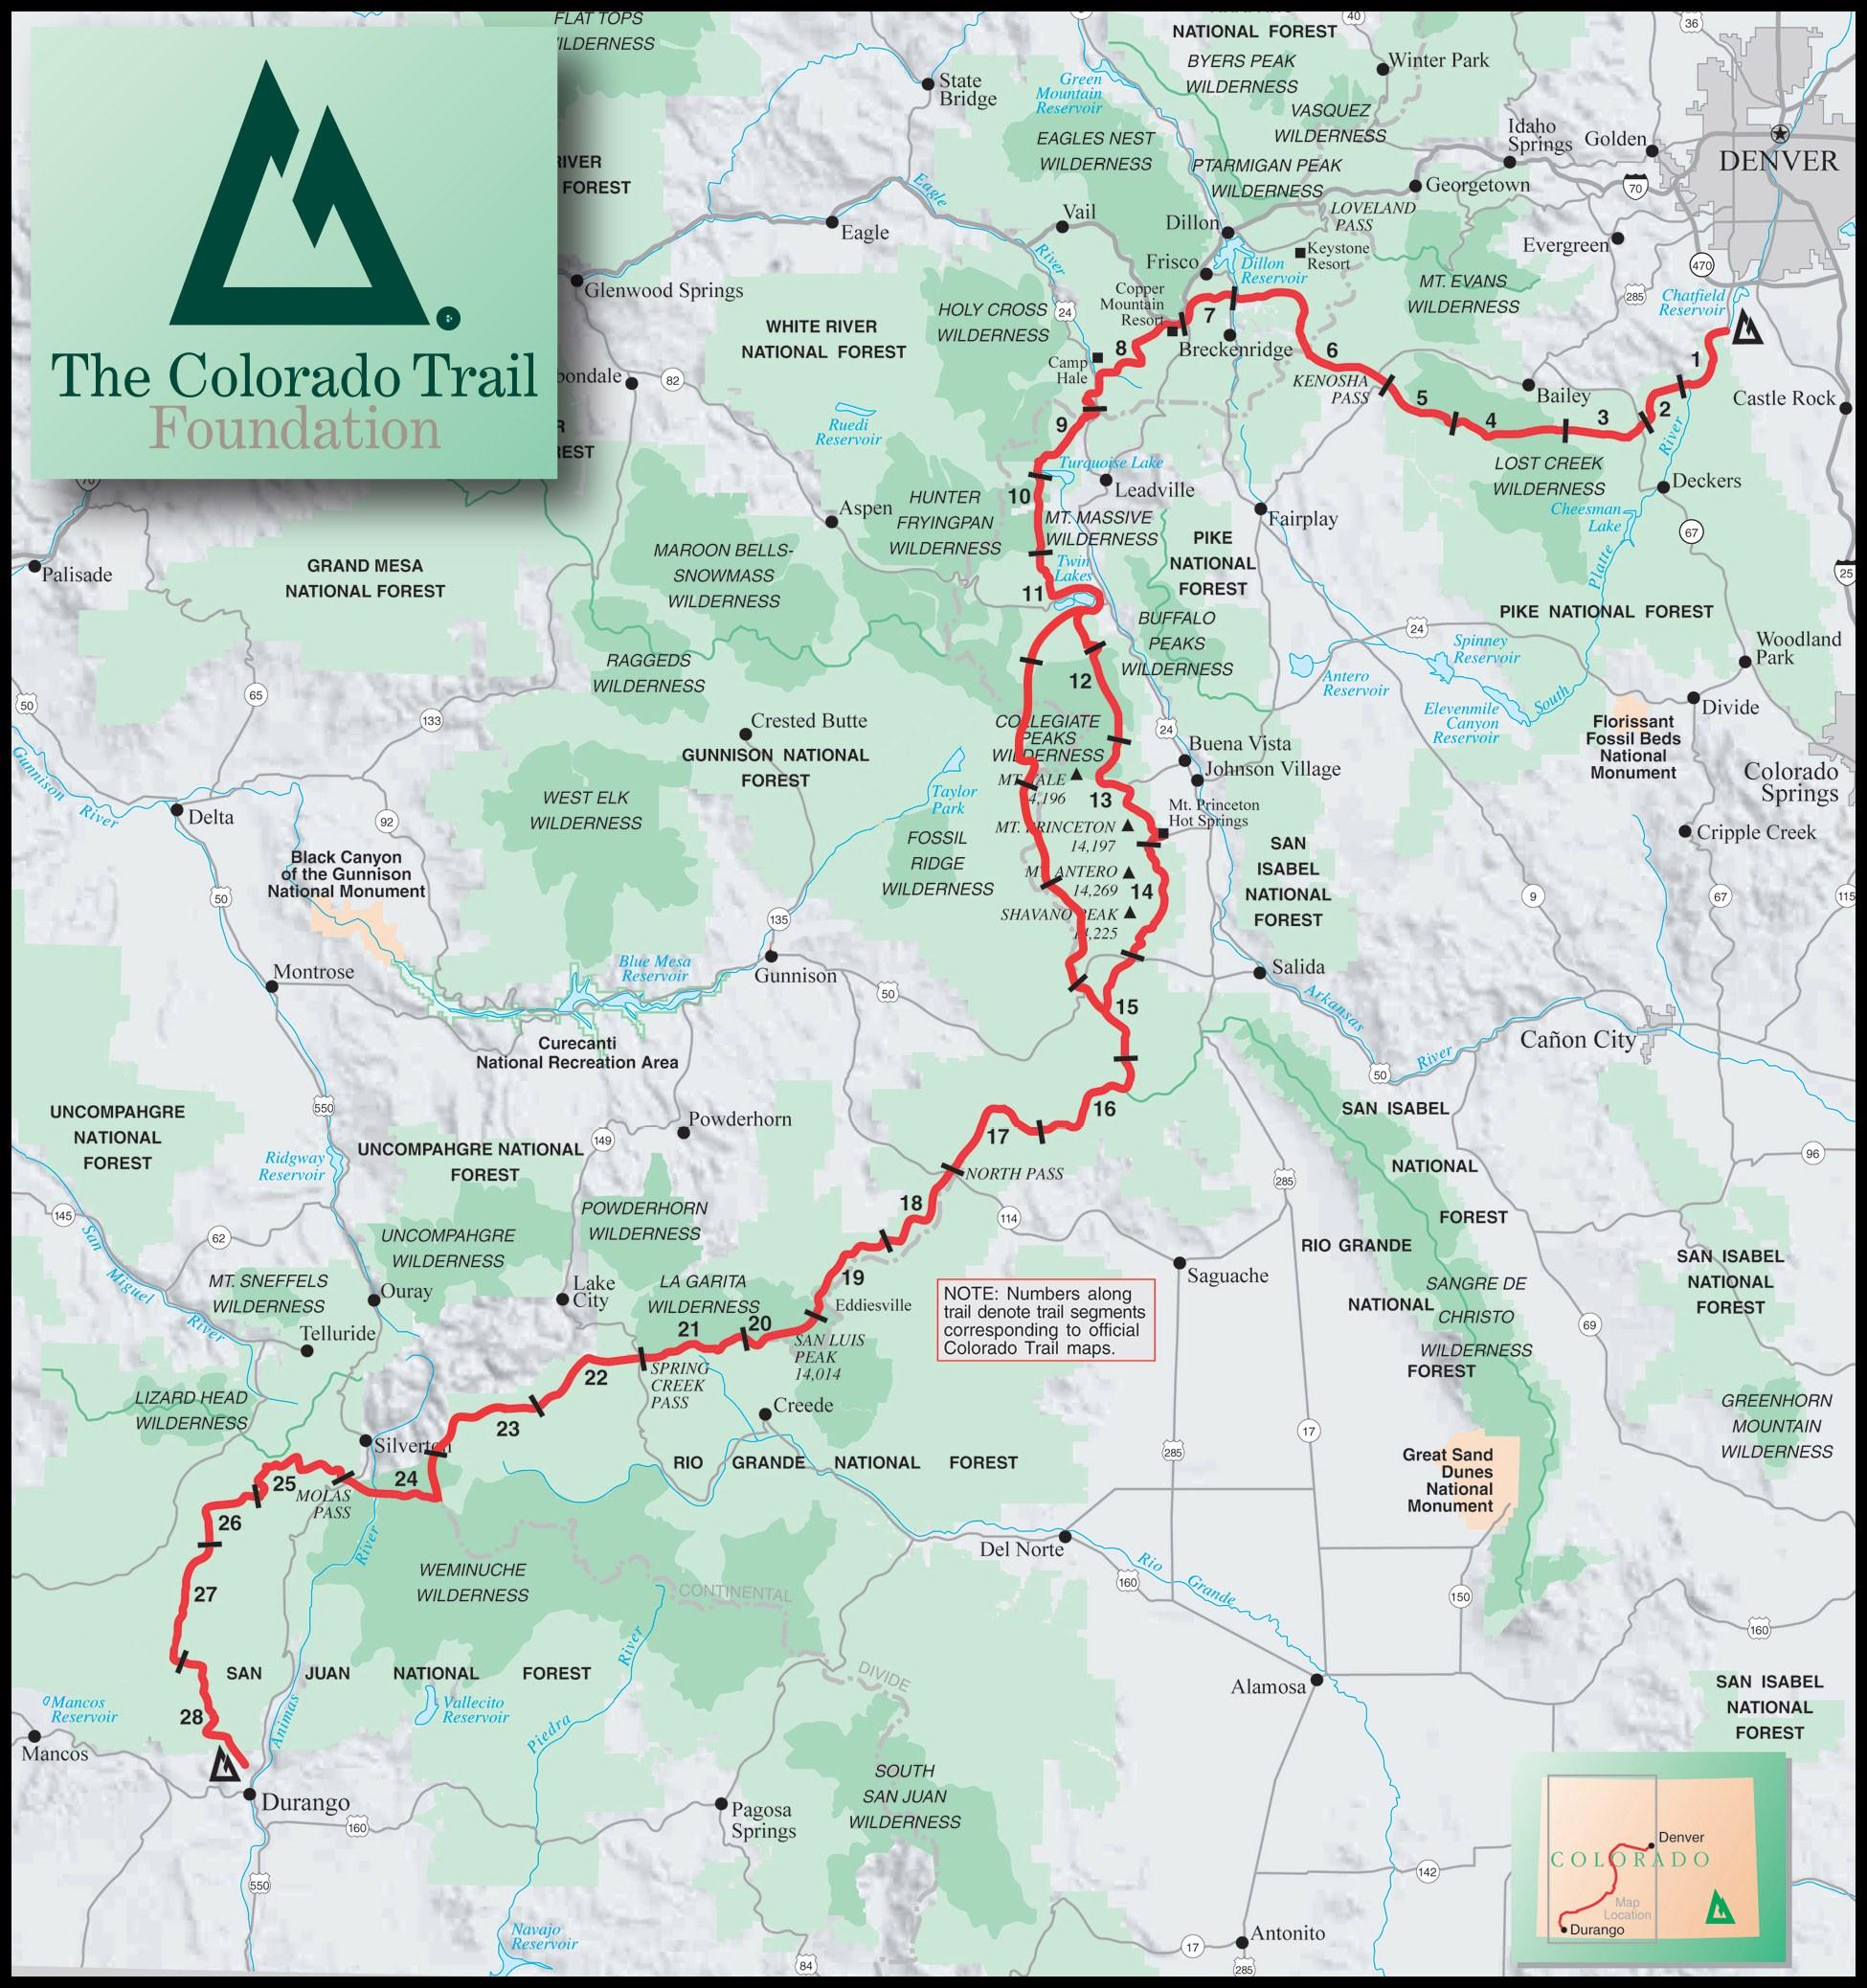 Colorado Trail (CTR) map